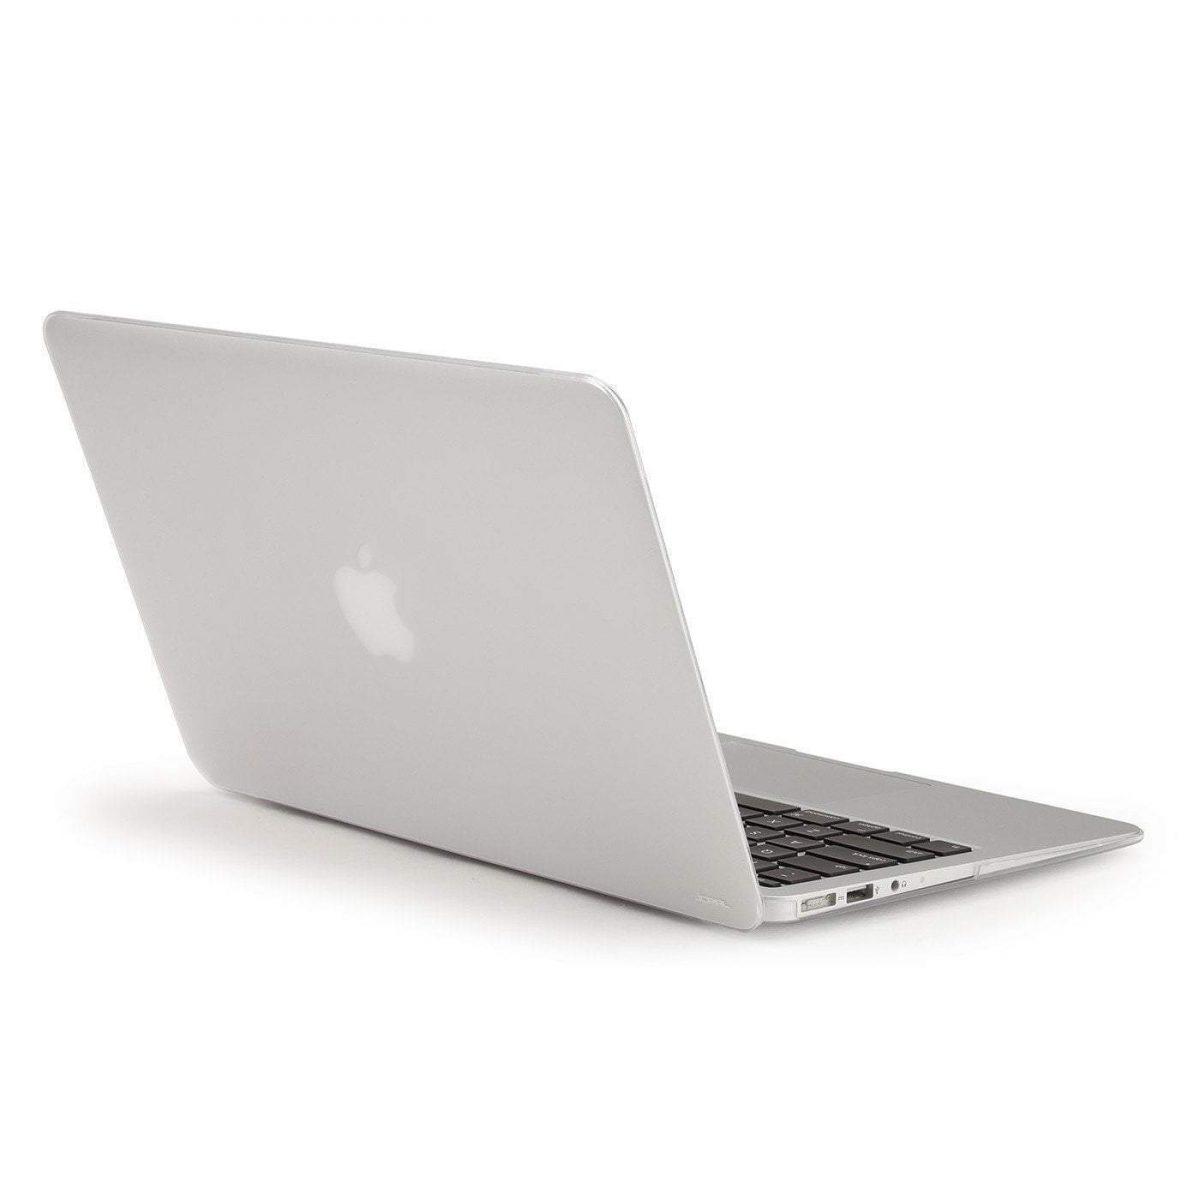 jcpal case macguard new ultra thin protective case for macbook air 13 macbook air 13 matte clear 27065063189 2048x 1200x1200 محافظ مک بوک ایر 11 اینچ فوق نازک جی سی پال | فروشگاه اینترنتی آی تی پخش